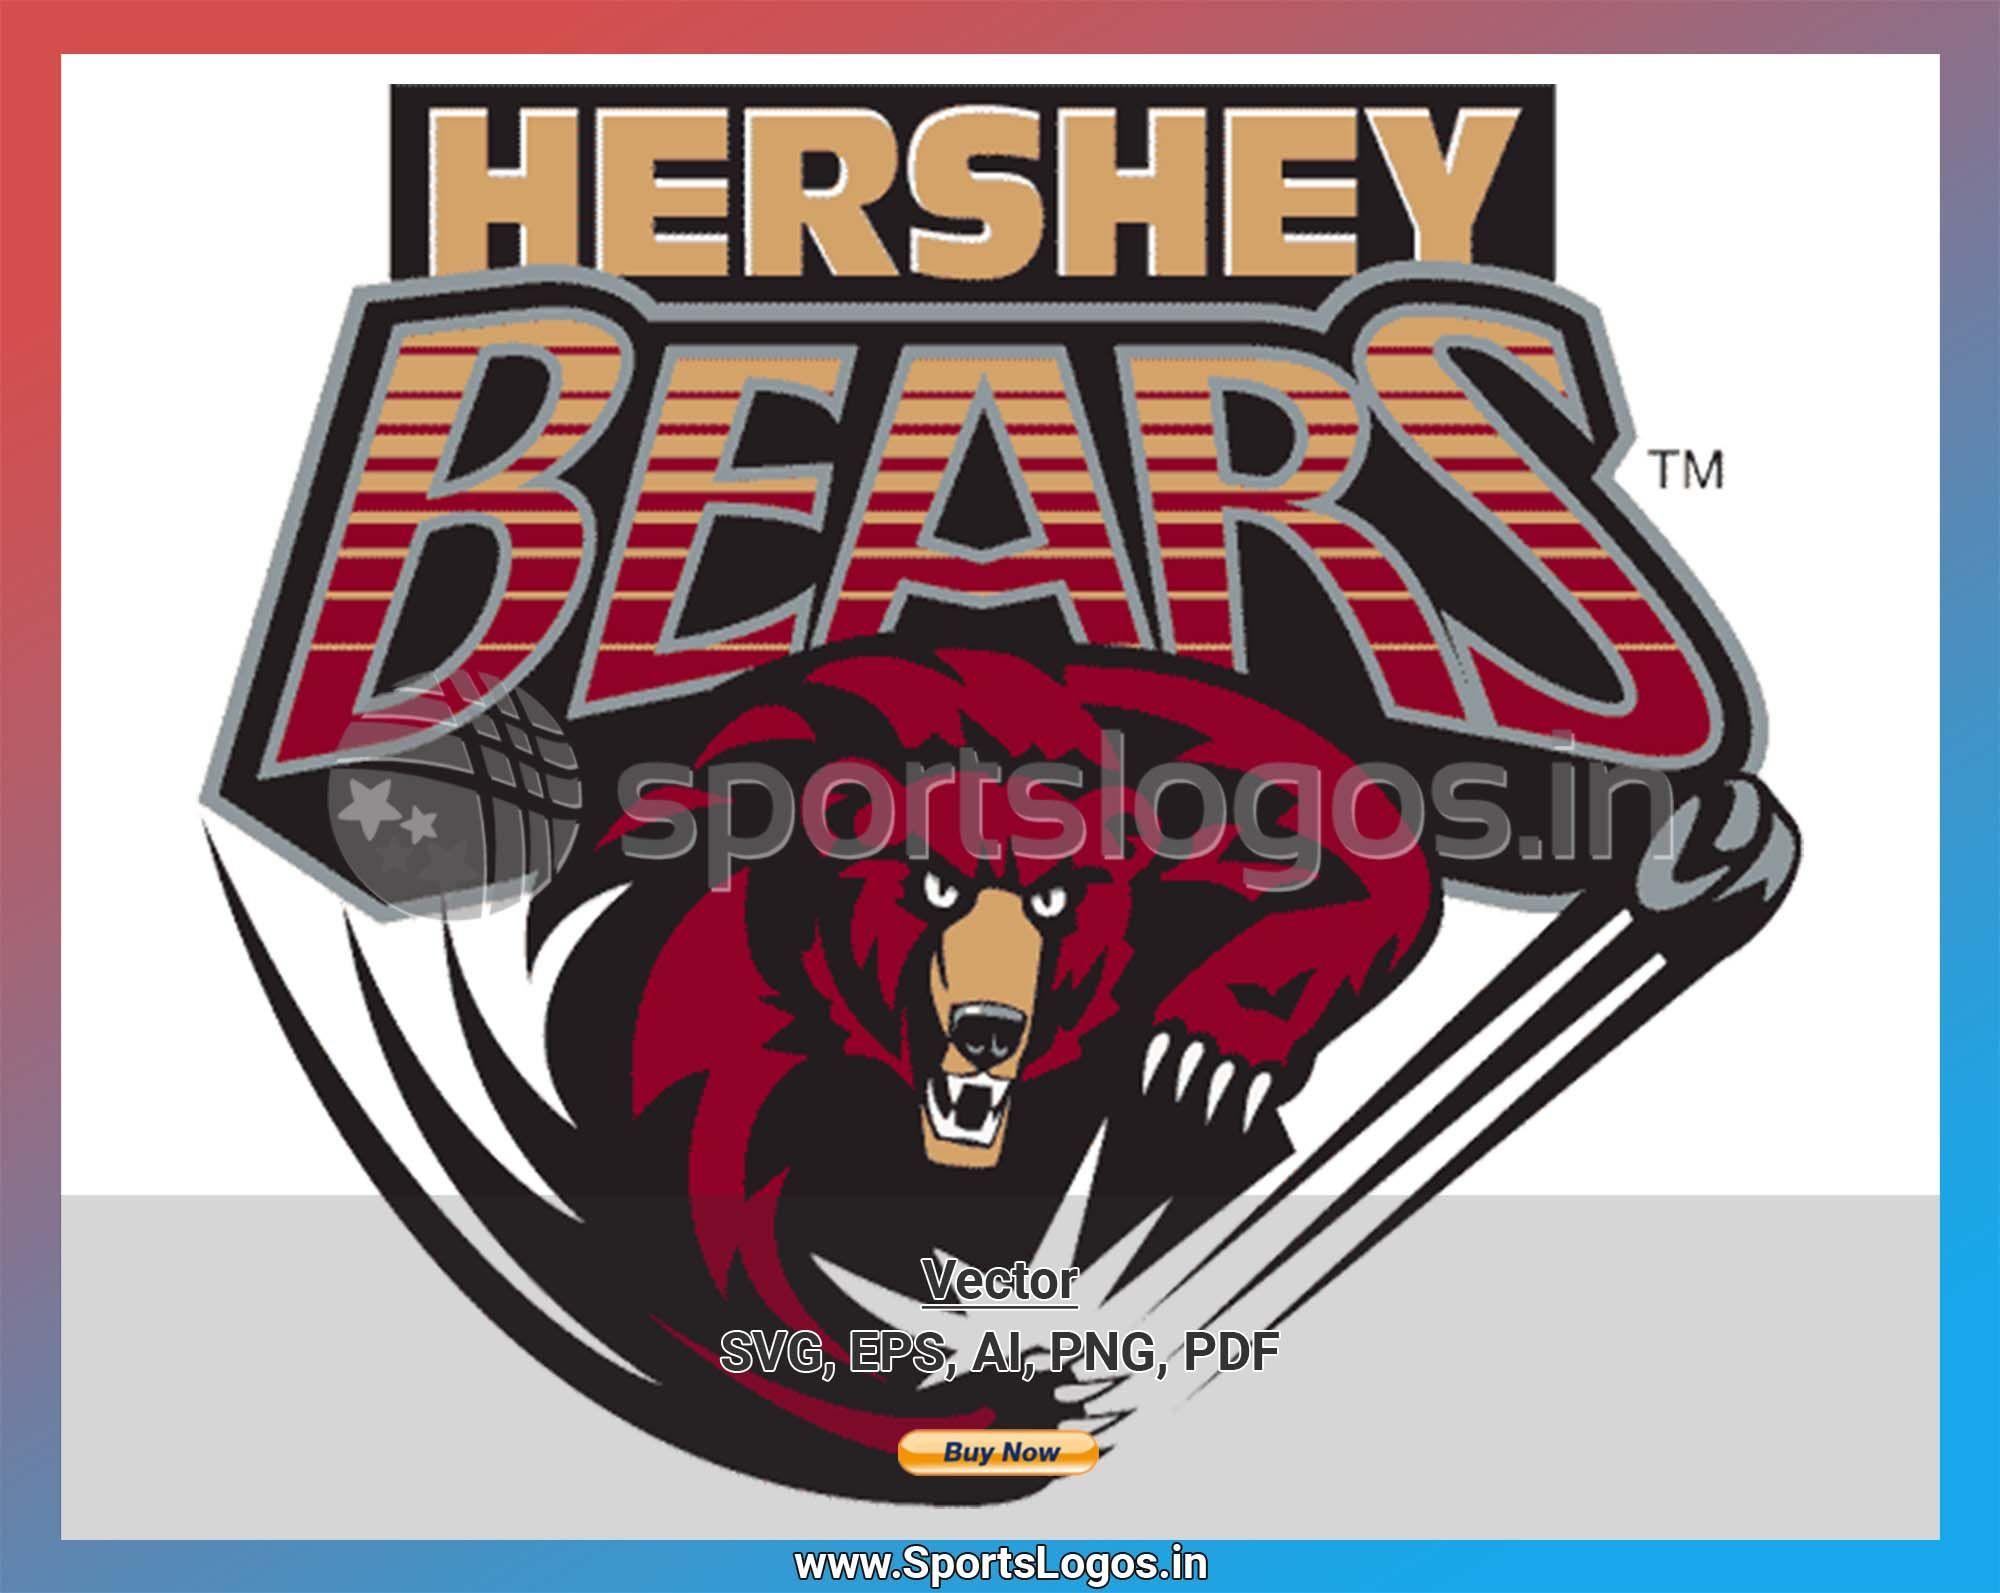 Hershey Bears Hockey Sports Vector Svg Logo In 5 Formats Spln001831 Sports Logos Embroidery Vector For Nfl Nba Nhl Mlb Milb And More Hershey Bears American Hockey League Sport Hockey